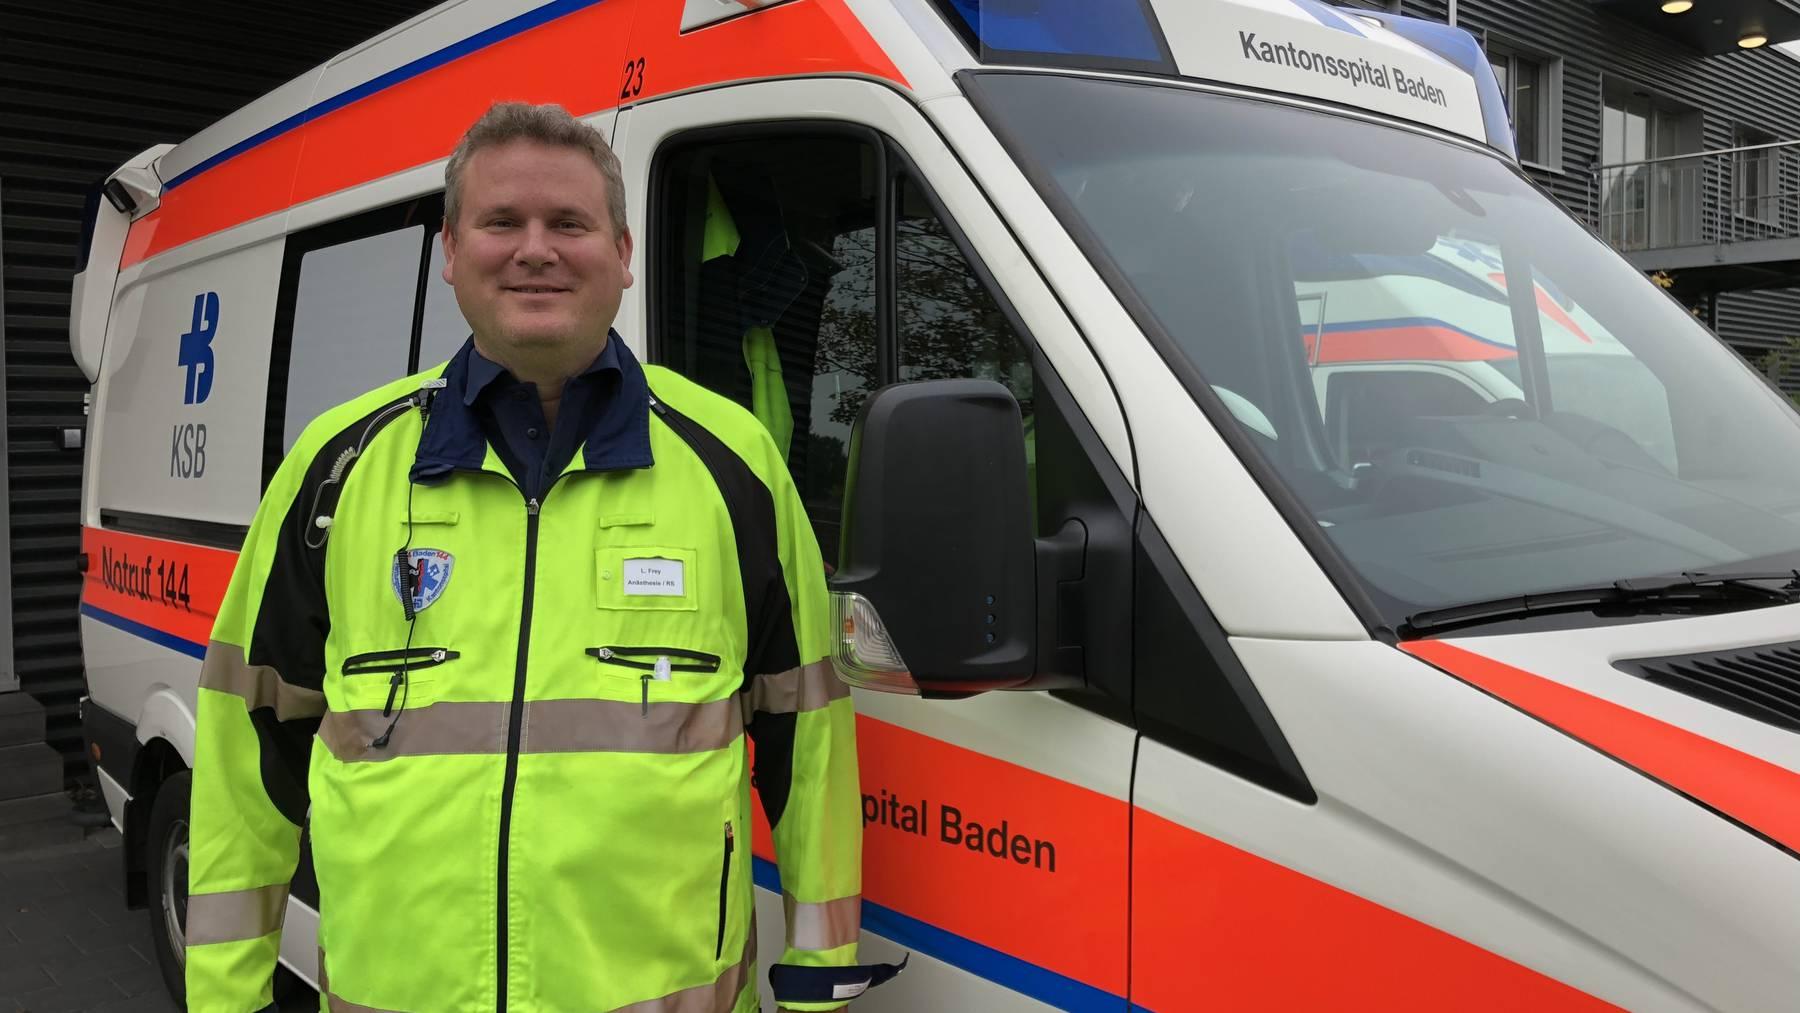 Lukas Frey, Notfalldienst Kantonsspital Baden